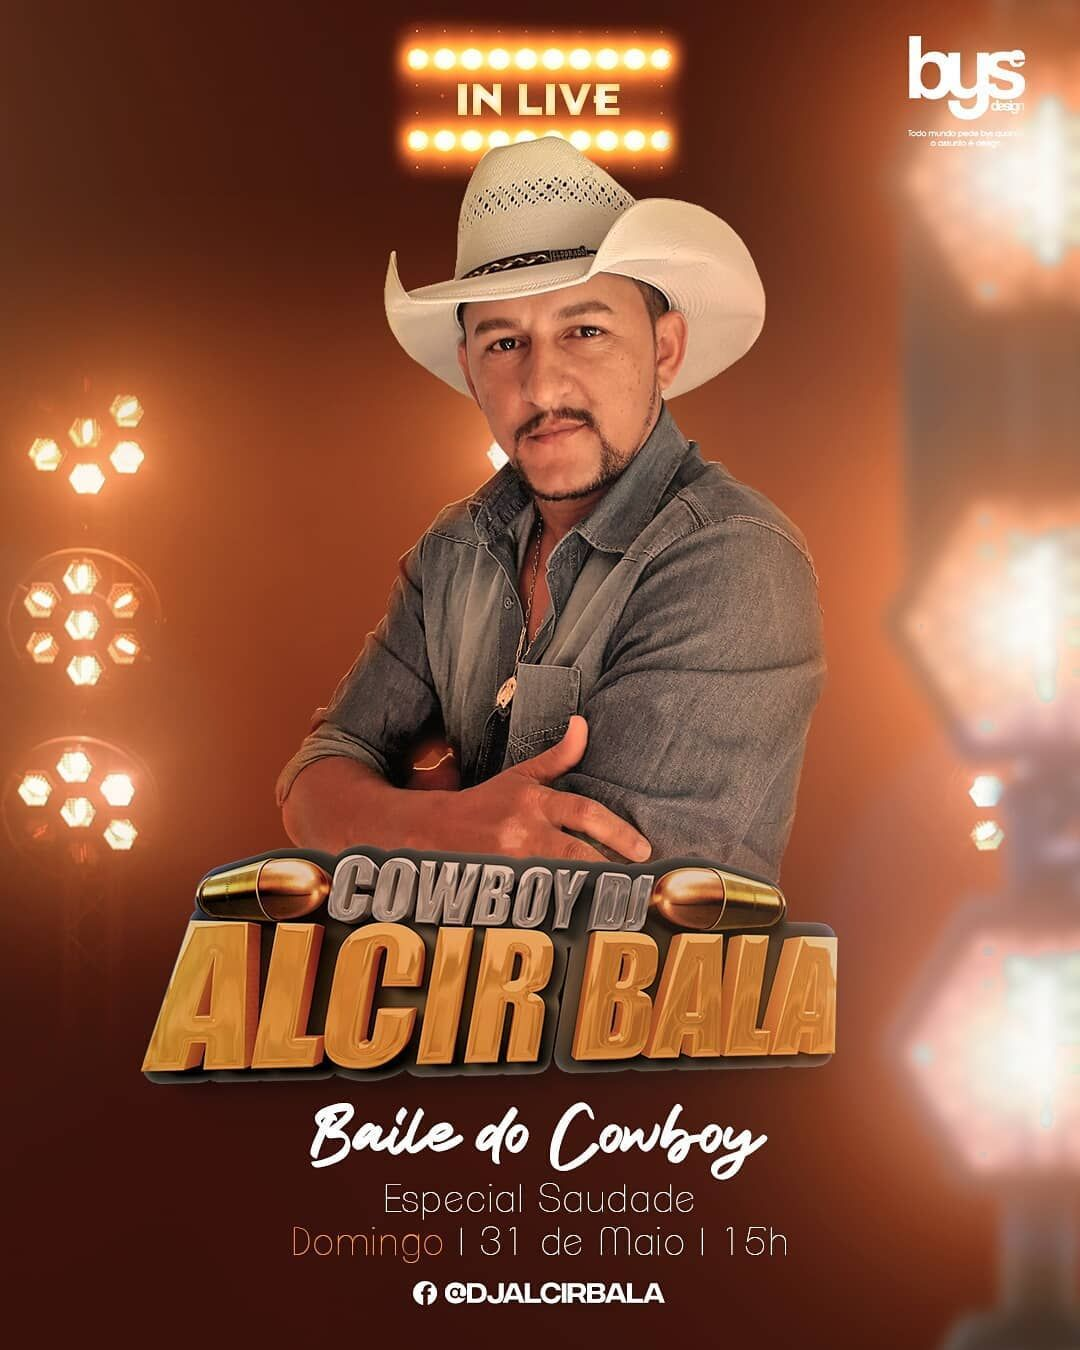 Baile do Cowboy | Dj Alcir Bala . . . . . . . . #djs #dj #music #djlife #party #pará #brega #melody #techno #producer #club #edm #djing #house #nightlife #pioneerdj #marcantes #radio #artist #bysdesign #electronicmusic #love #djlifestyle #photoshop #newmusic #djset #soundcloud #producers #musica #elbysbastos